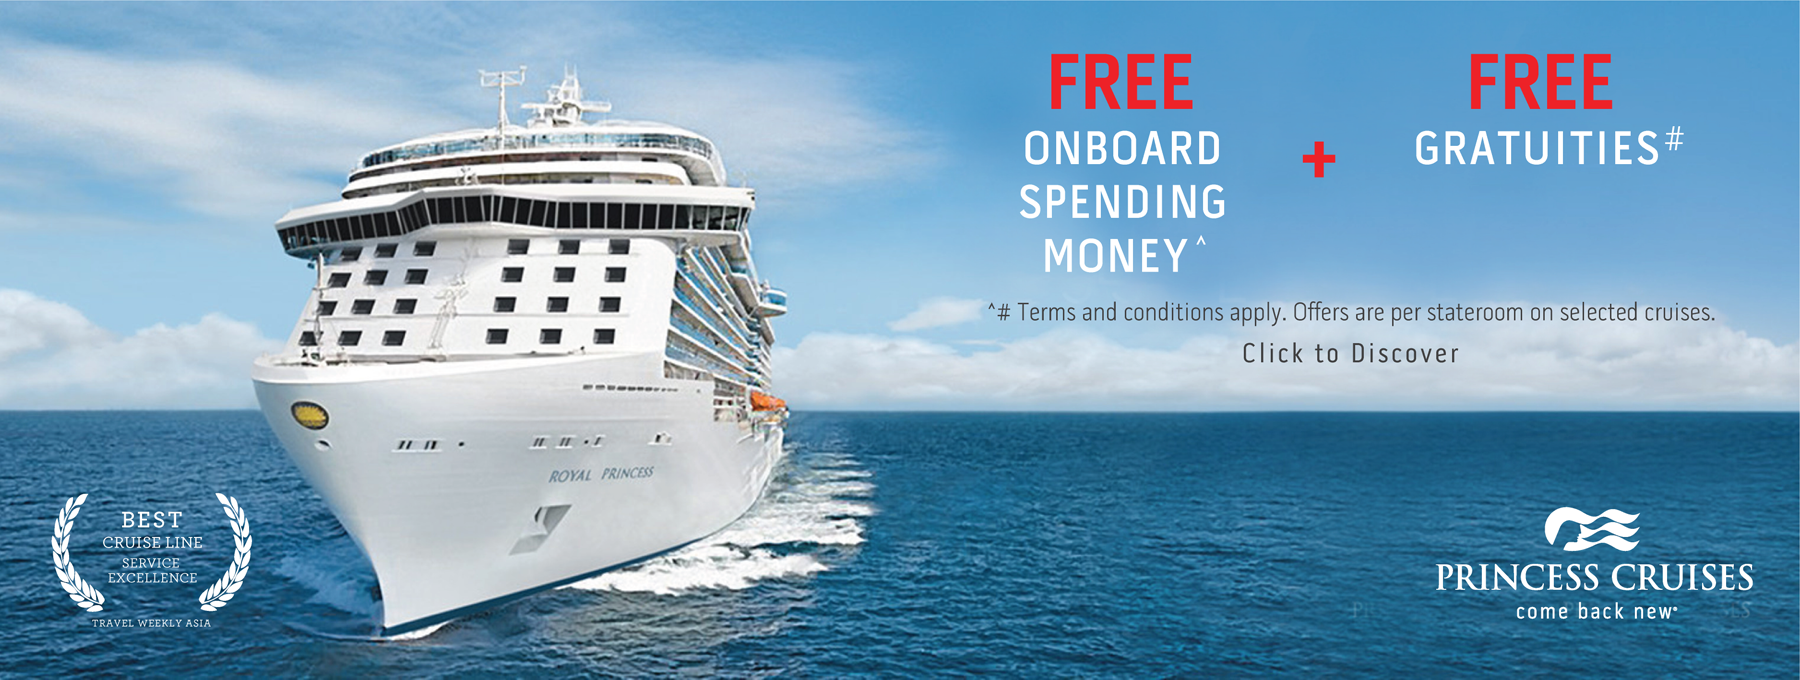 Princess Cruises - SOUTHEAST ASIA TRAVEL FAIR PROMOTION